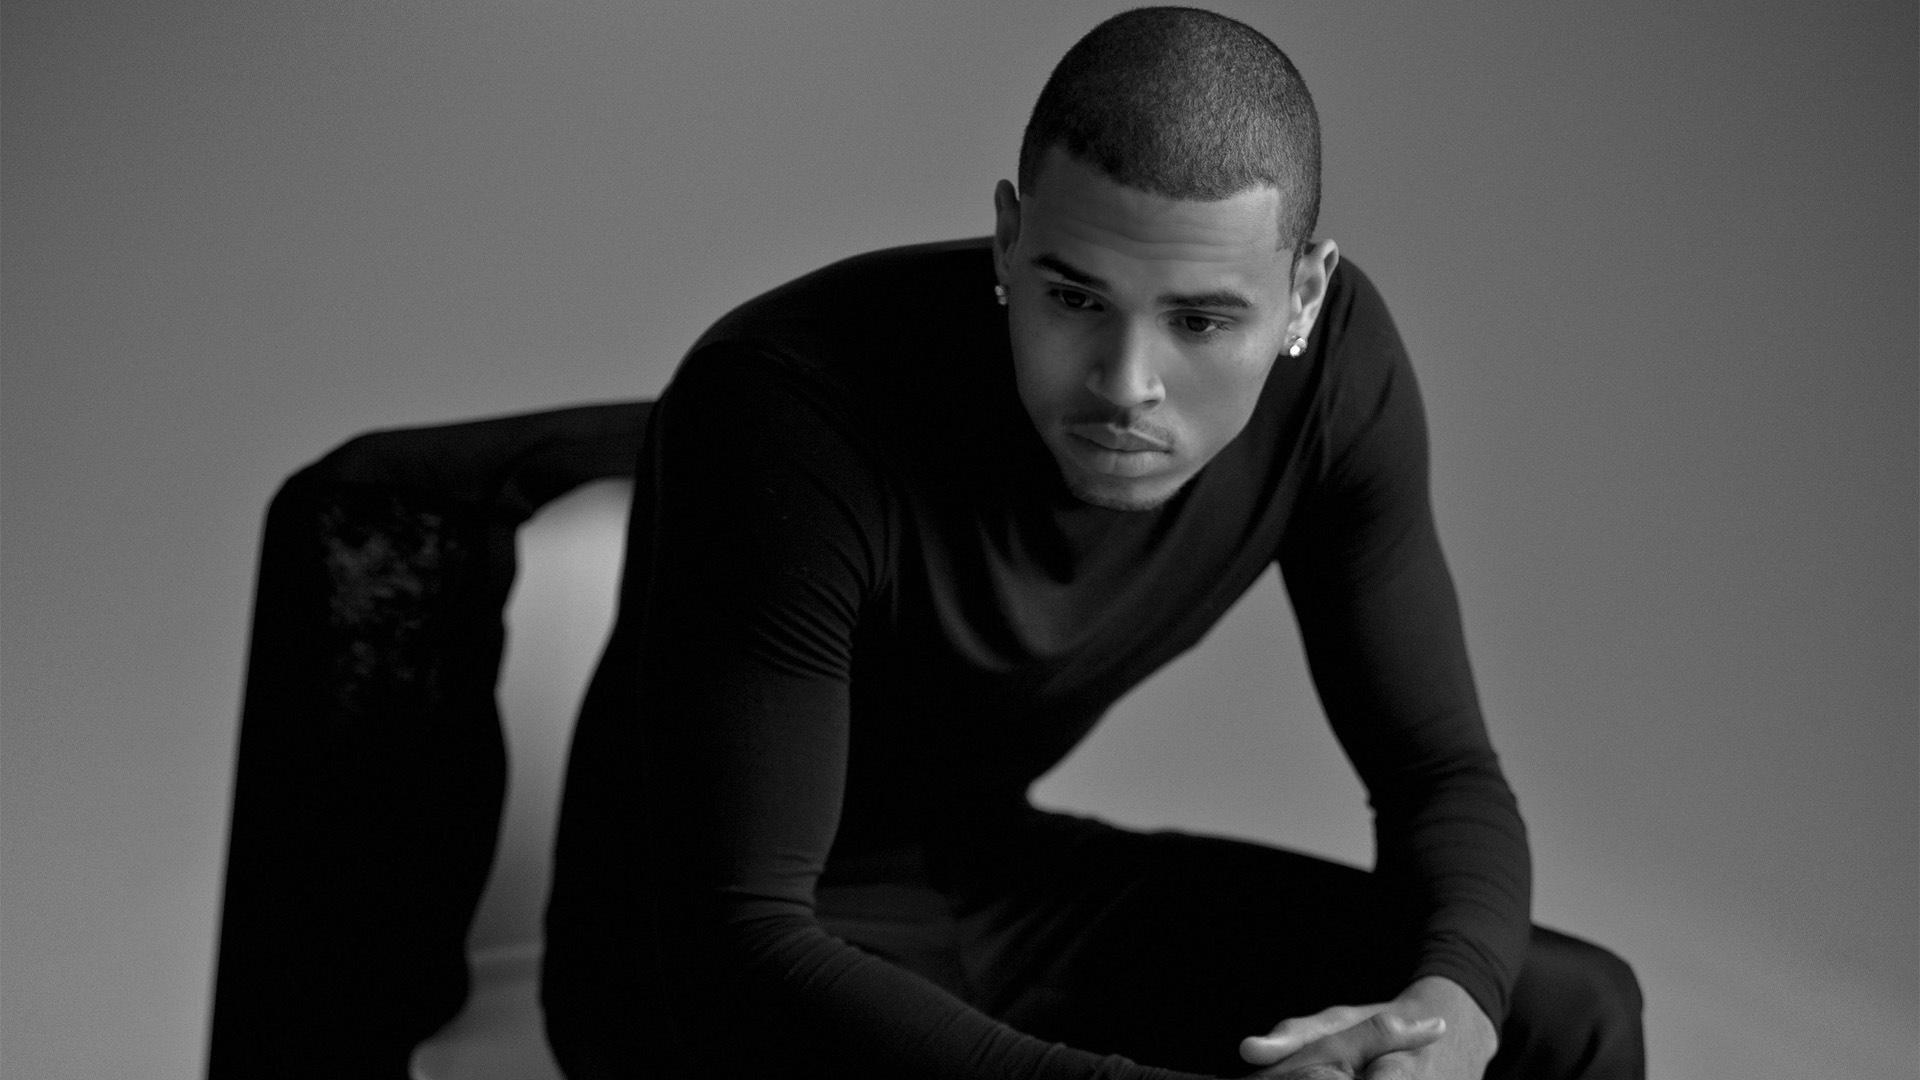 Chris Brown Widescreen